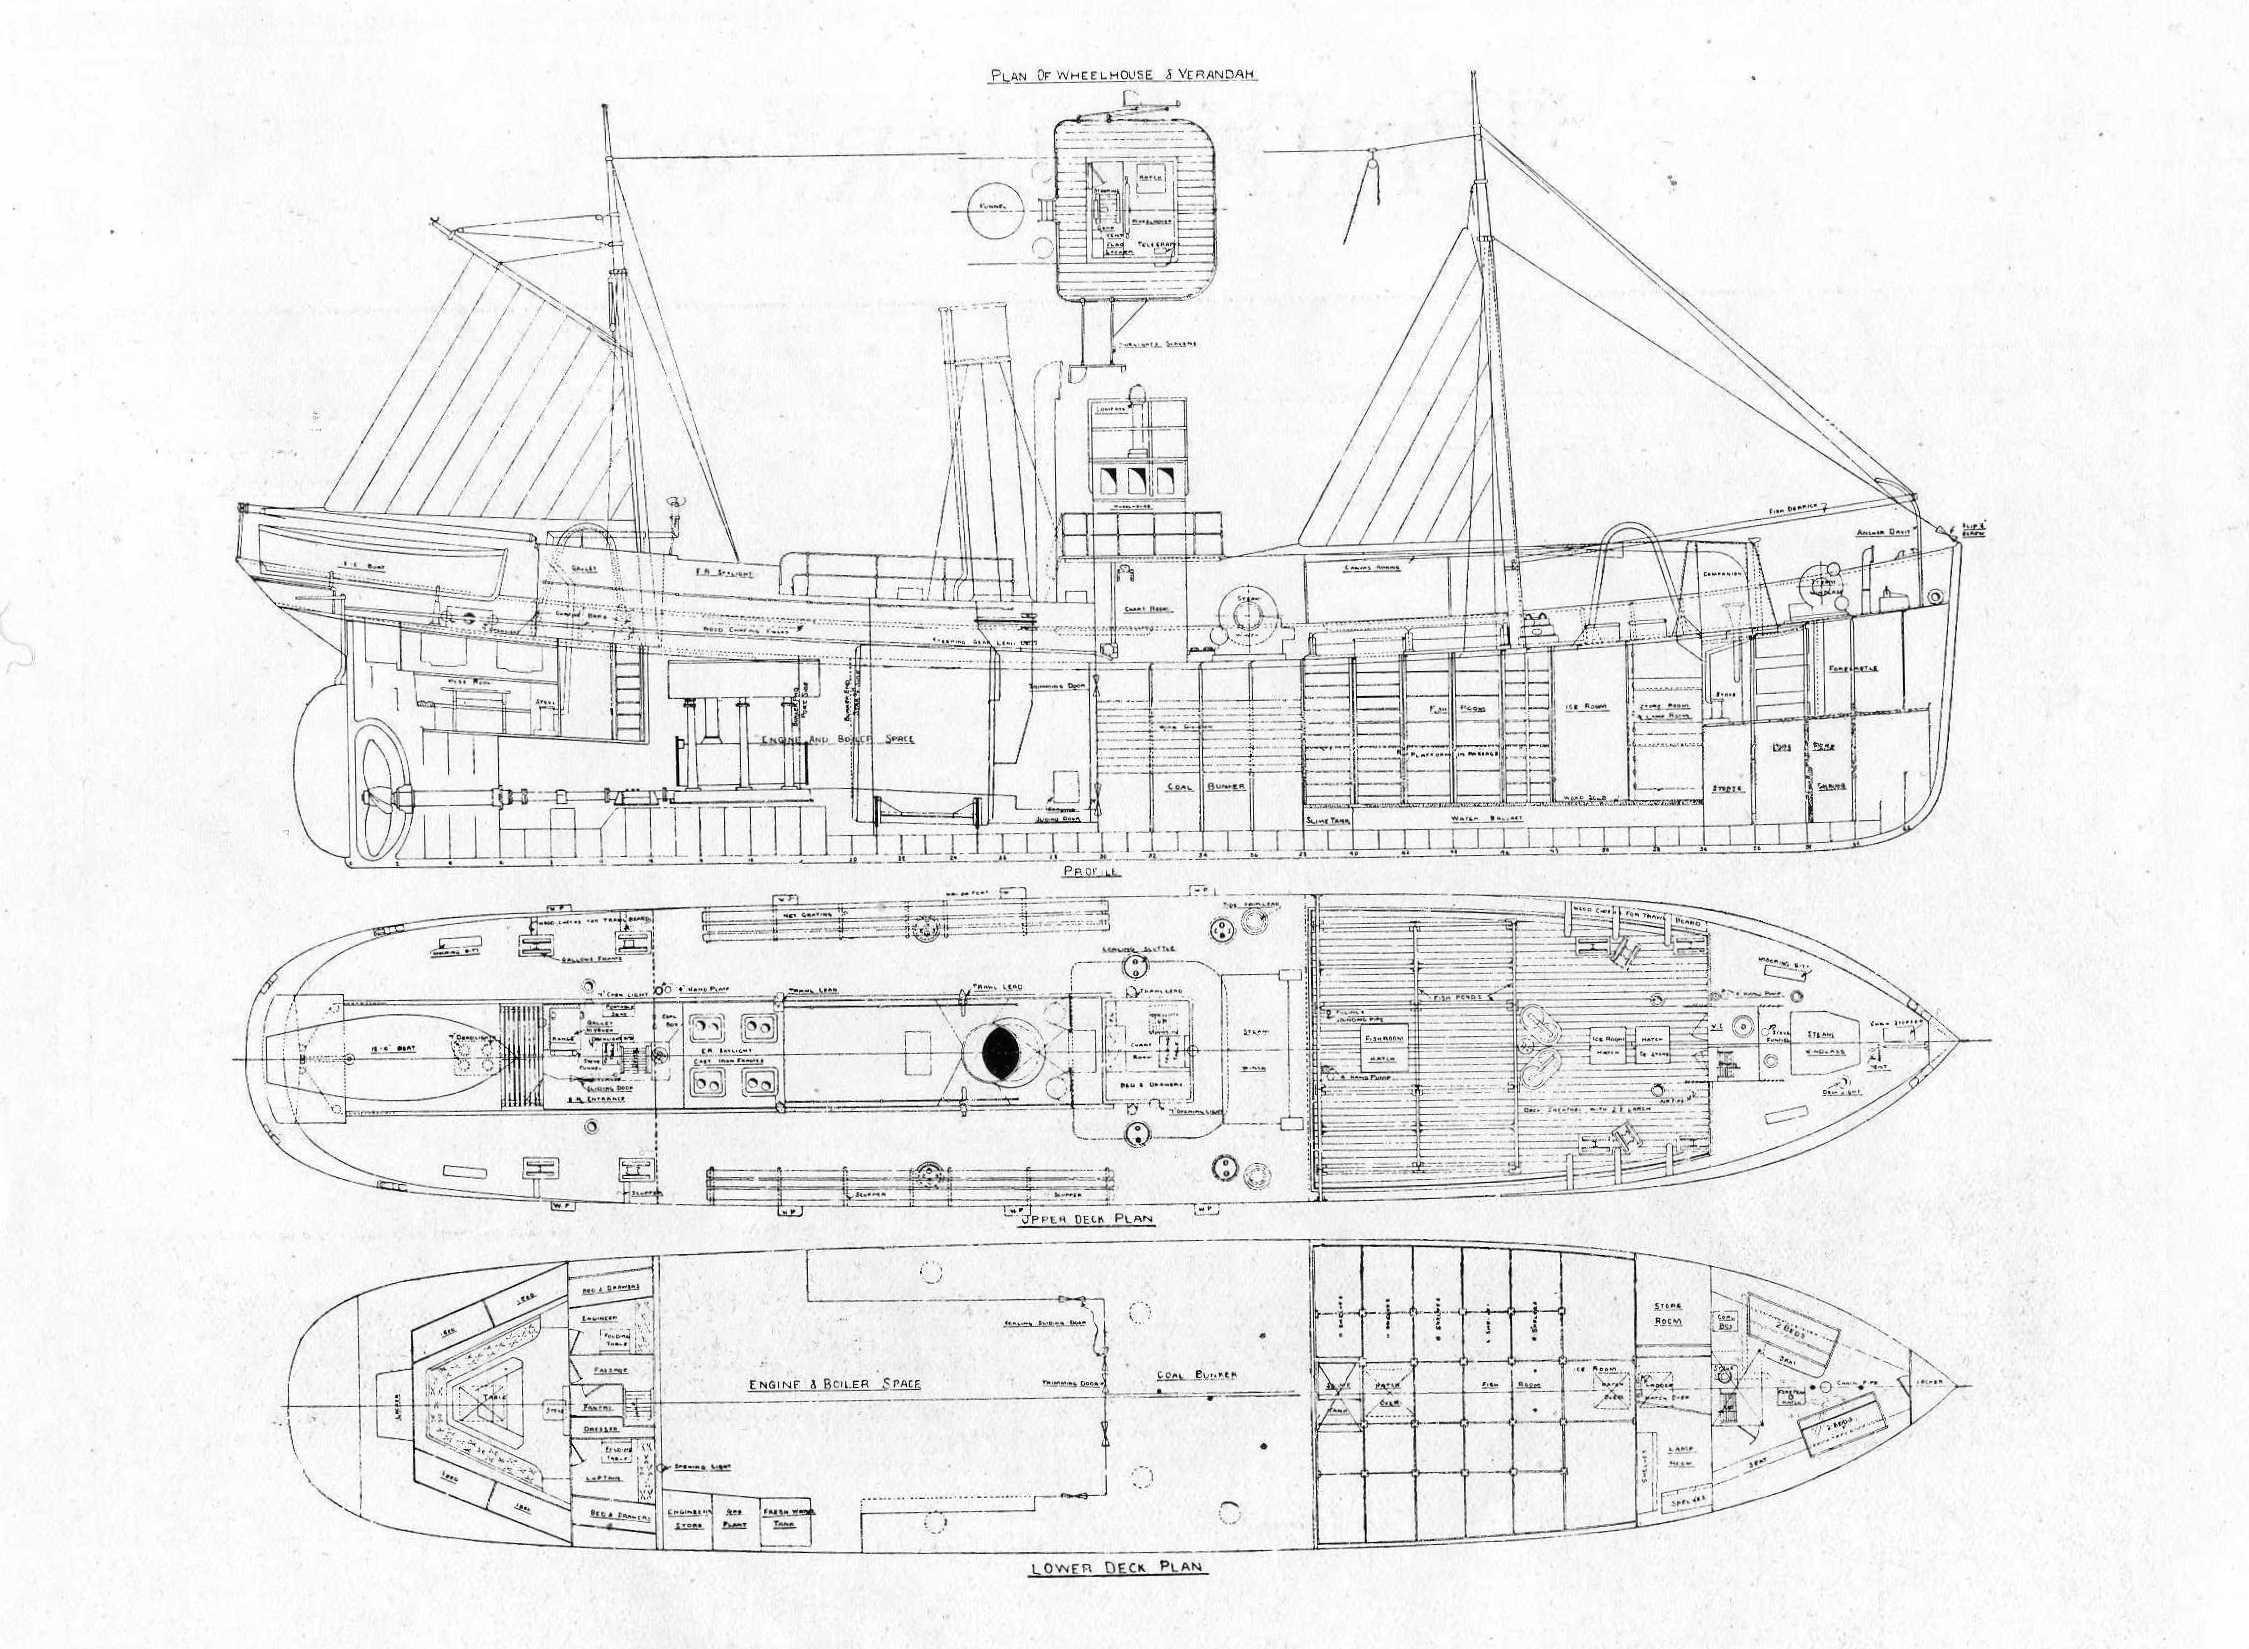 Chalutier Marsouin (New Cap Maquettes 1/30°) de Barnouic - Page 2 A_draw10